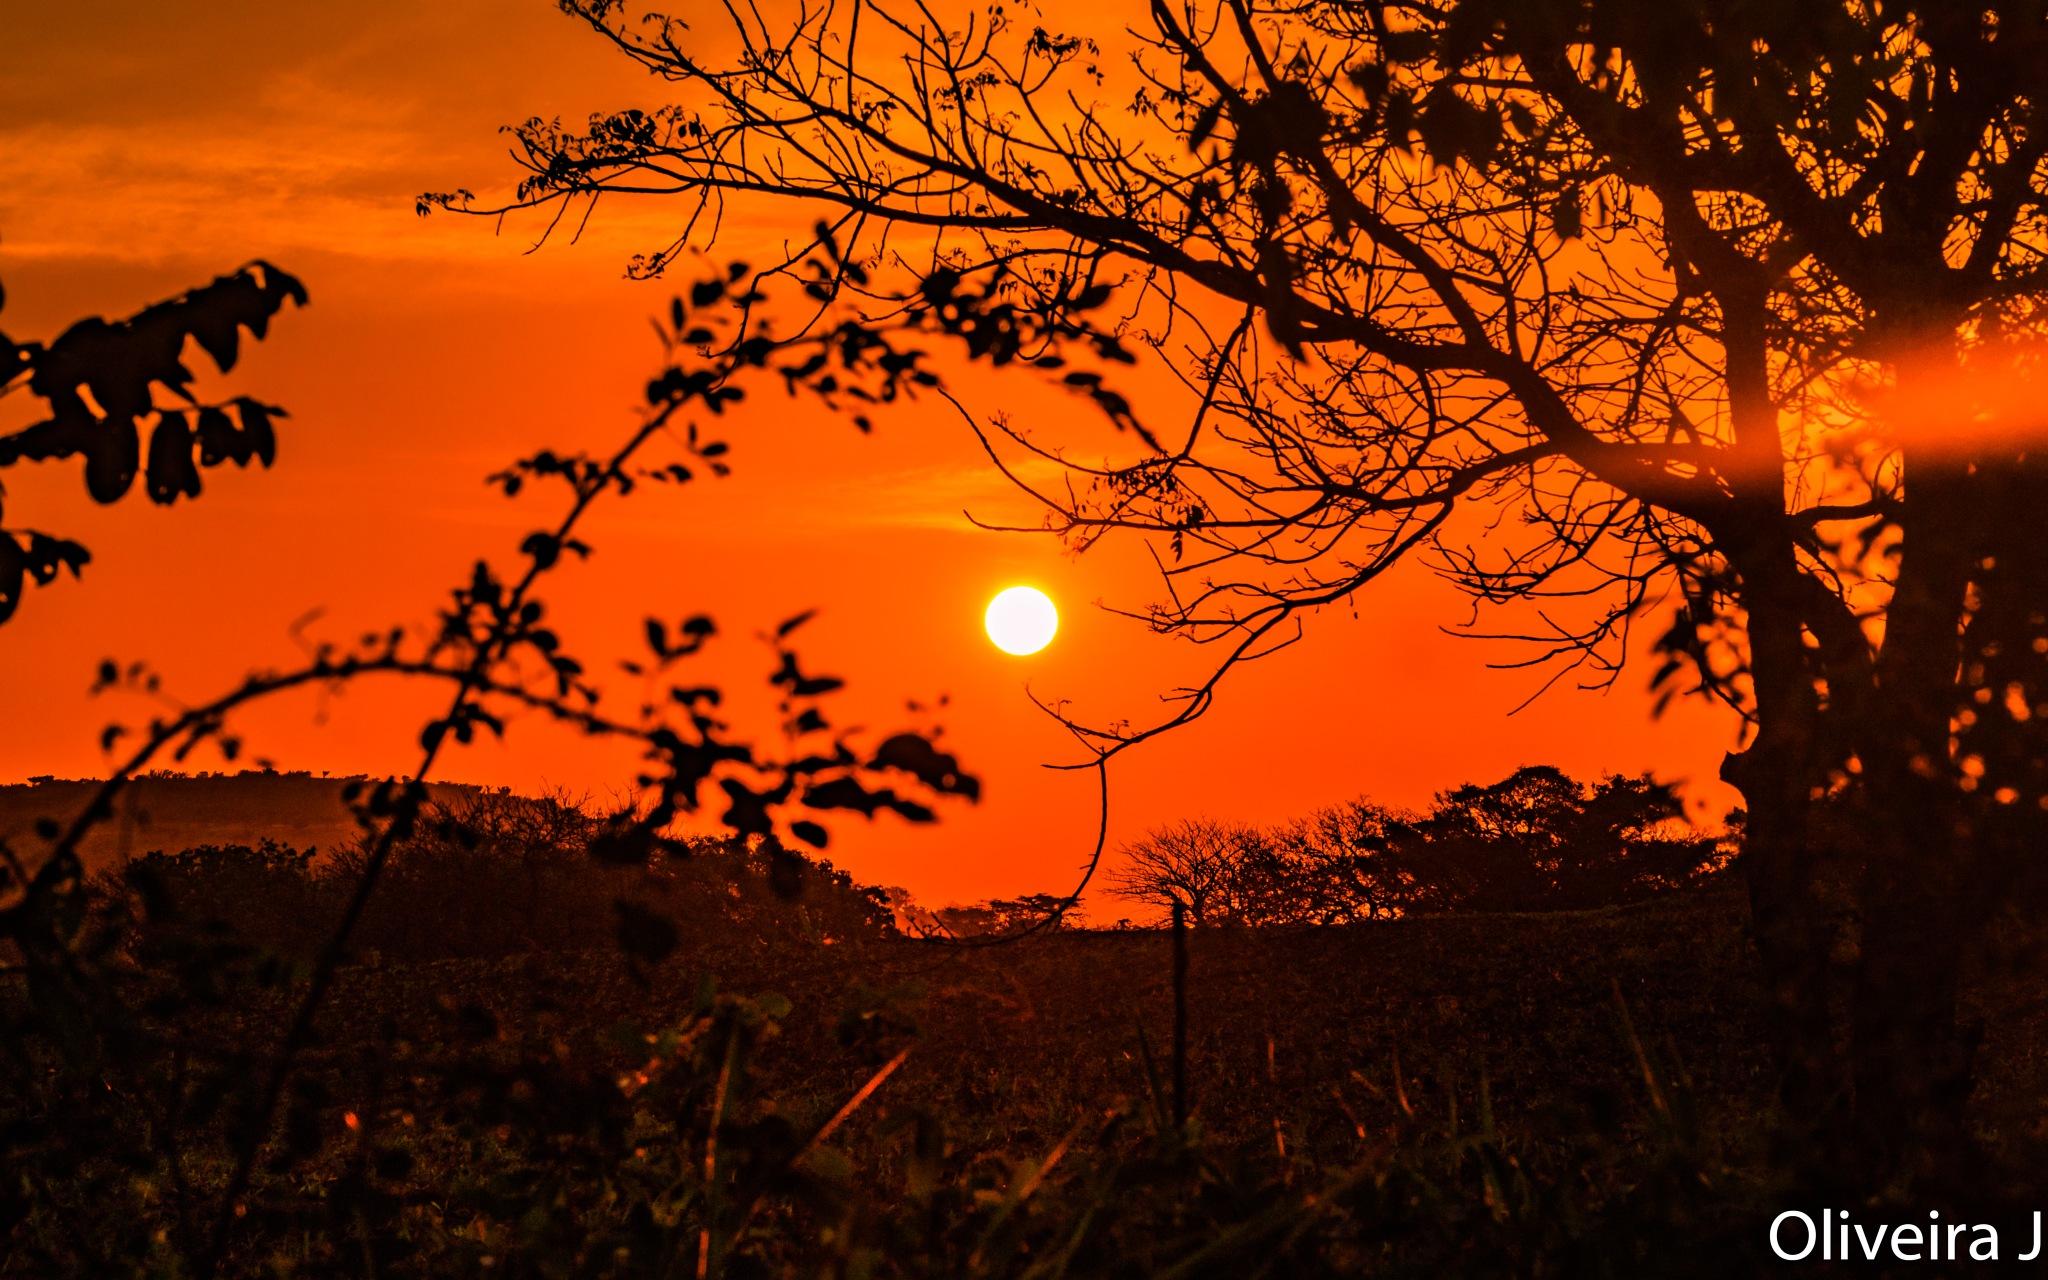 SUNSET by joseoliveira1694